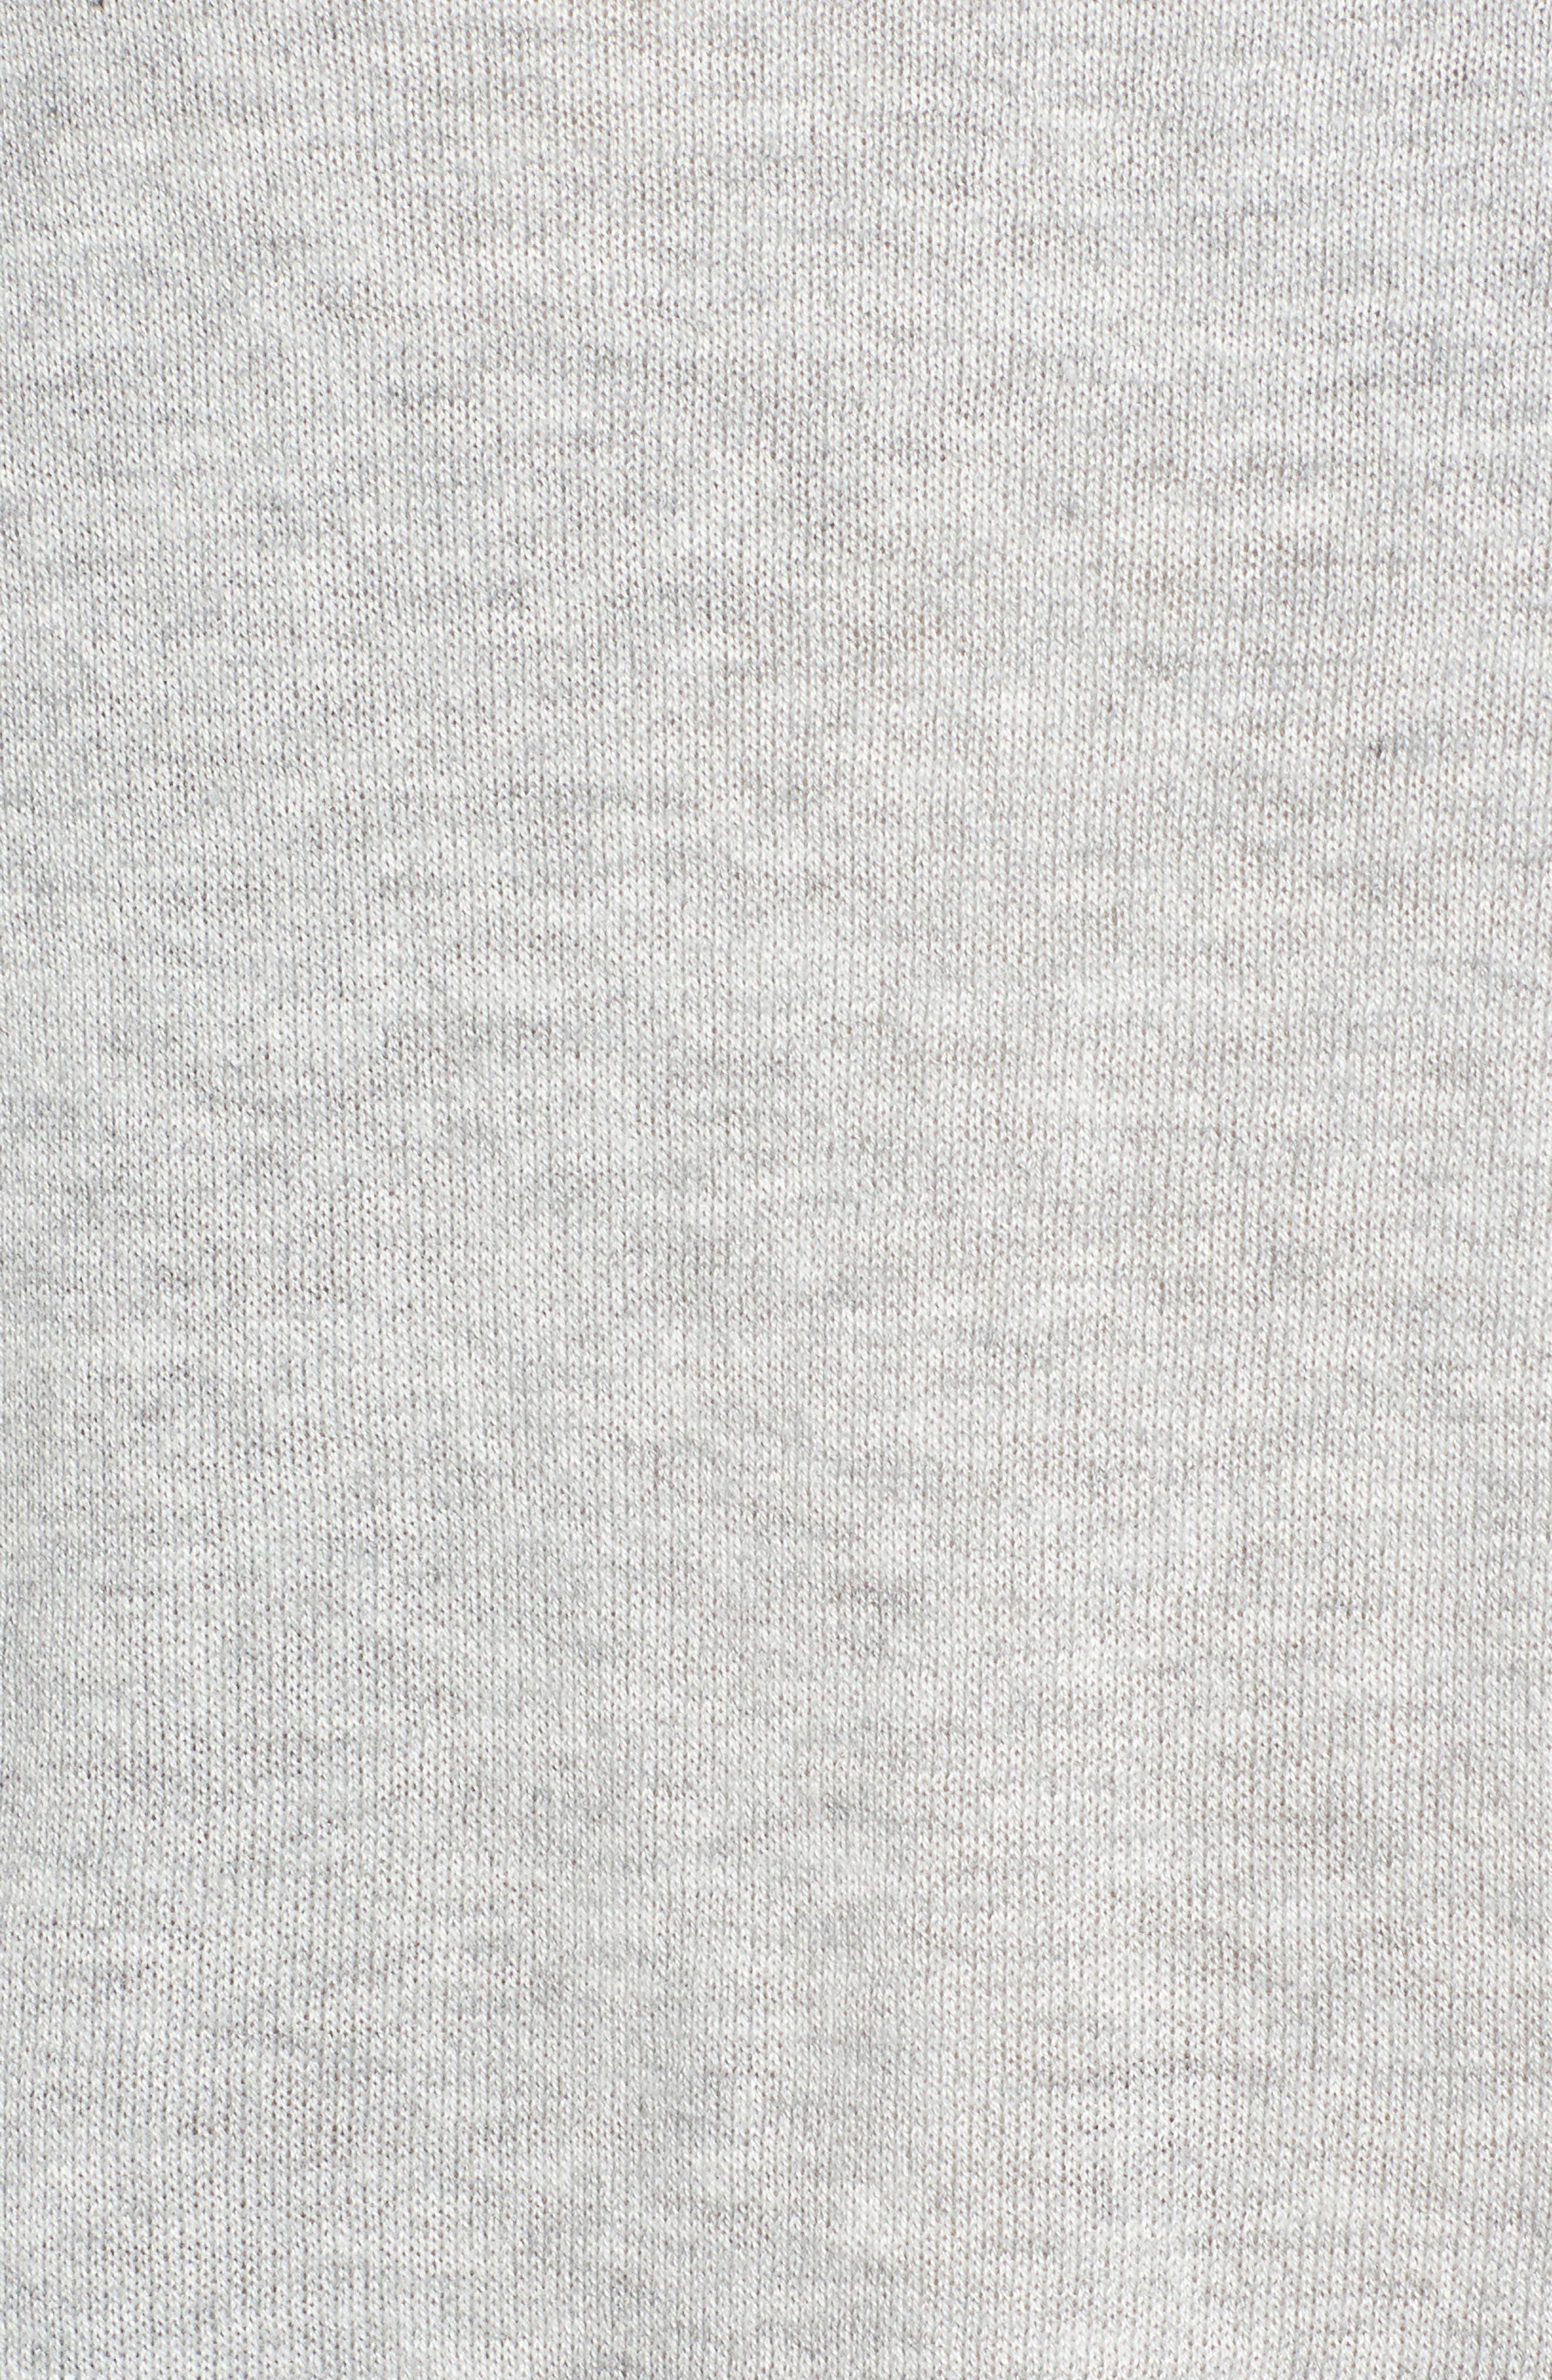 Convertible Bateau Neck Sweater,                             Alternate thumbnail 17, color,